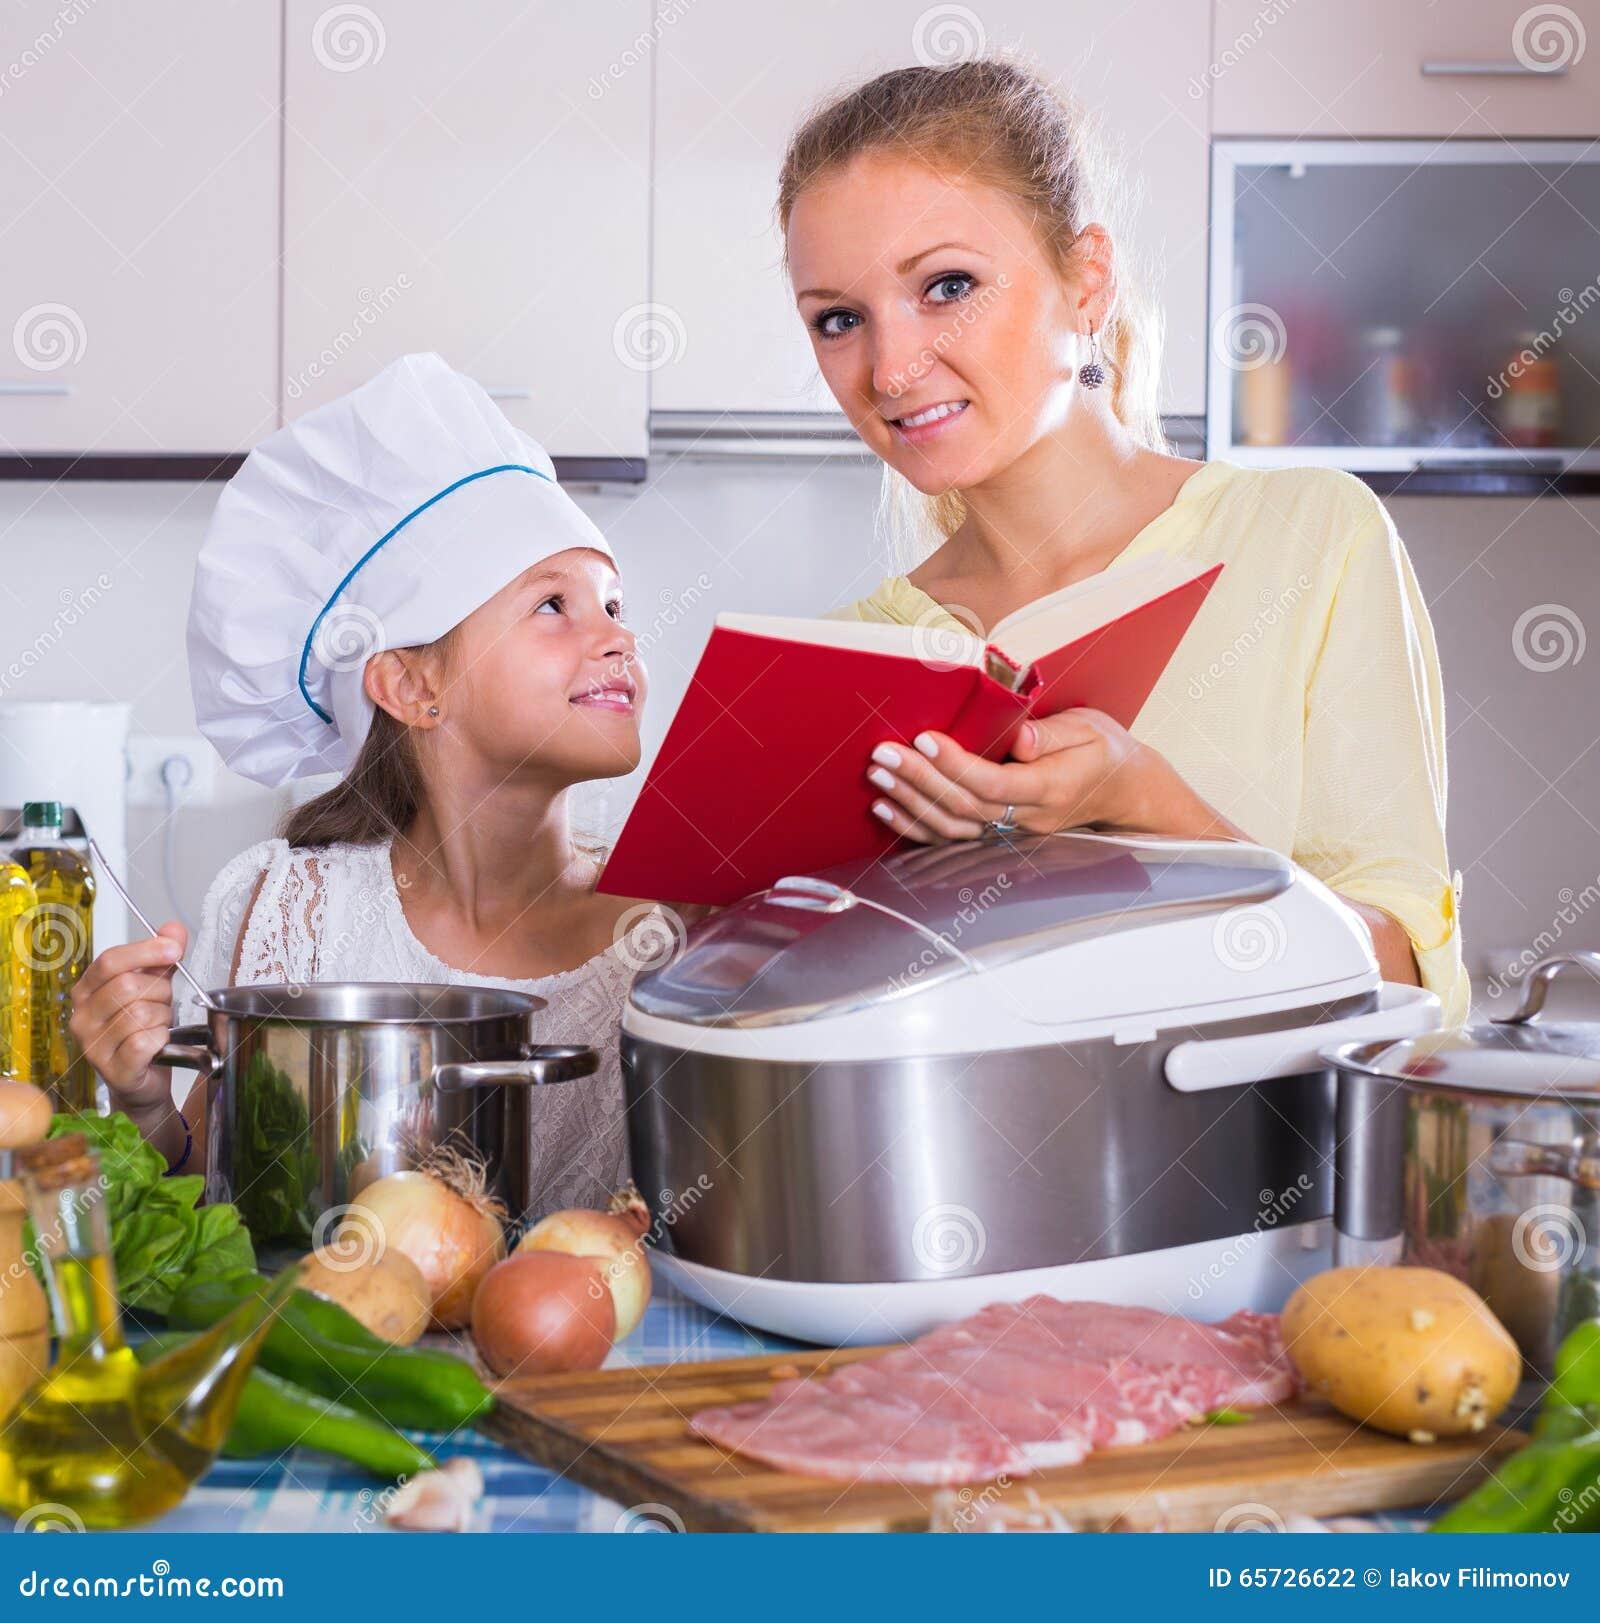 mom cooking food